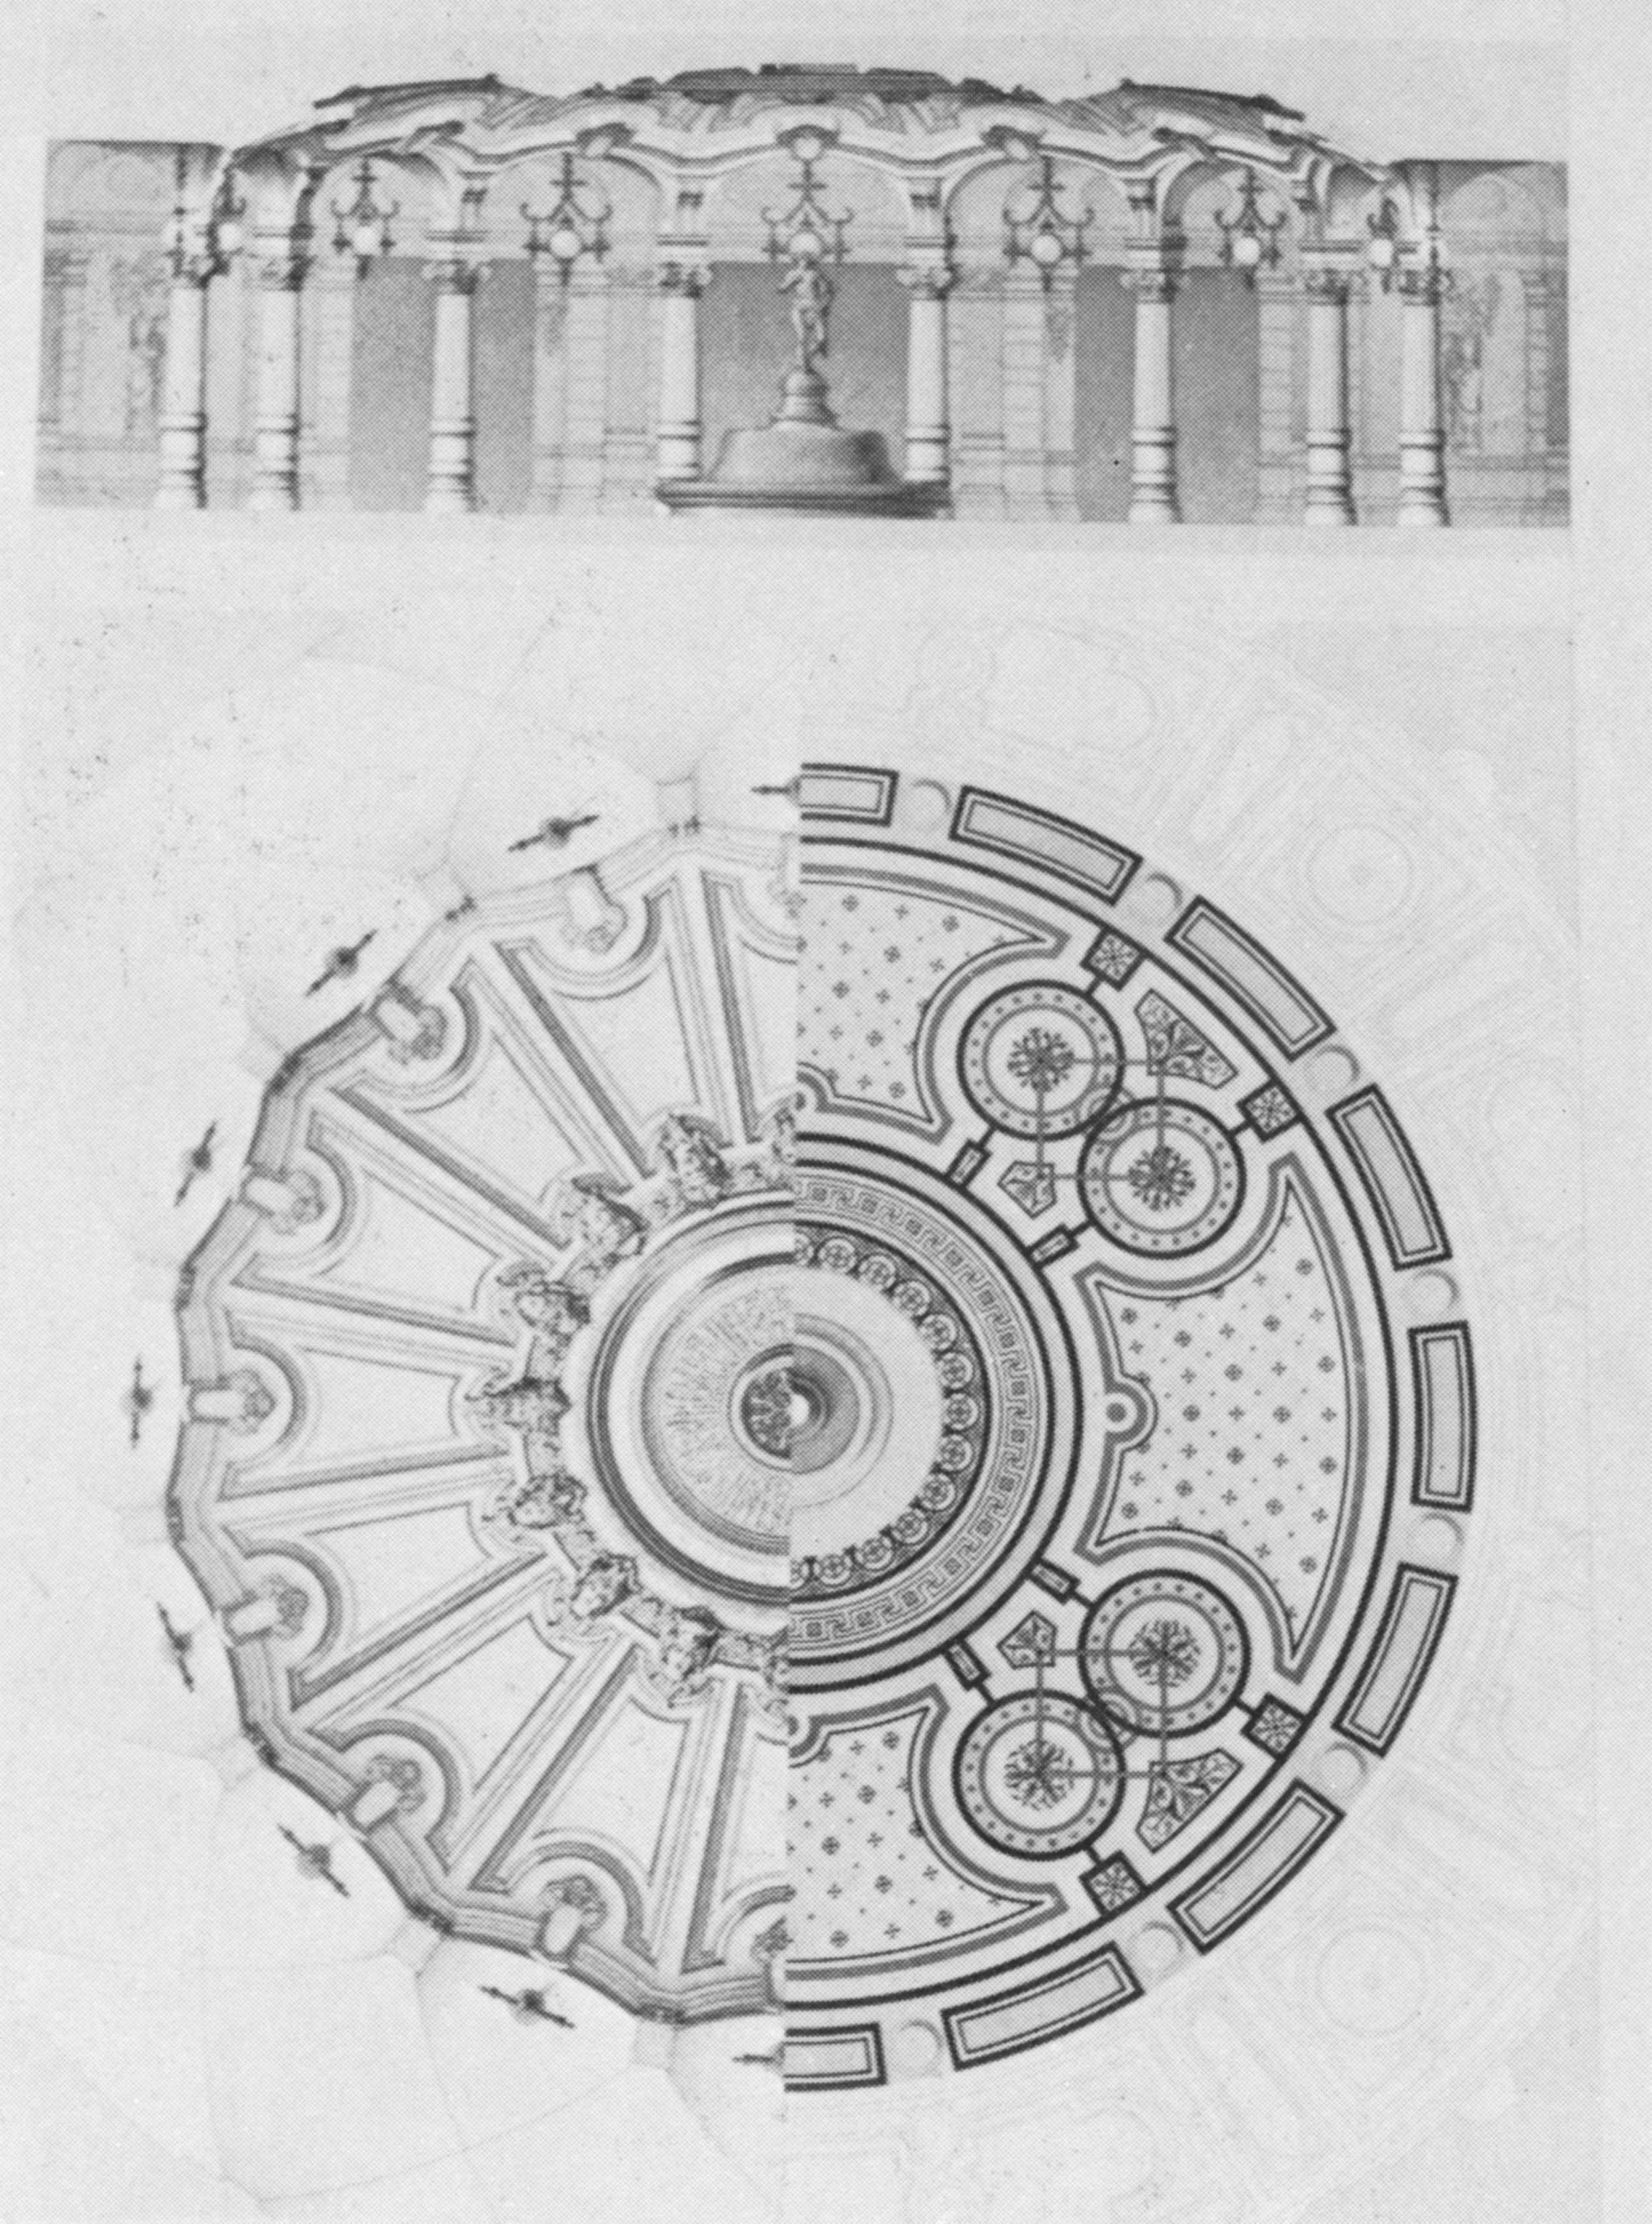 Elevation For Circular Plan : File palais garnier elevation of the circular vestibule